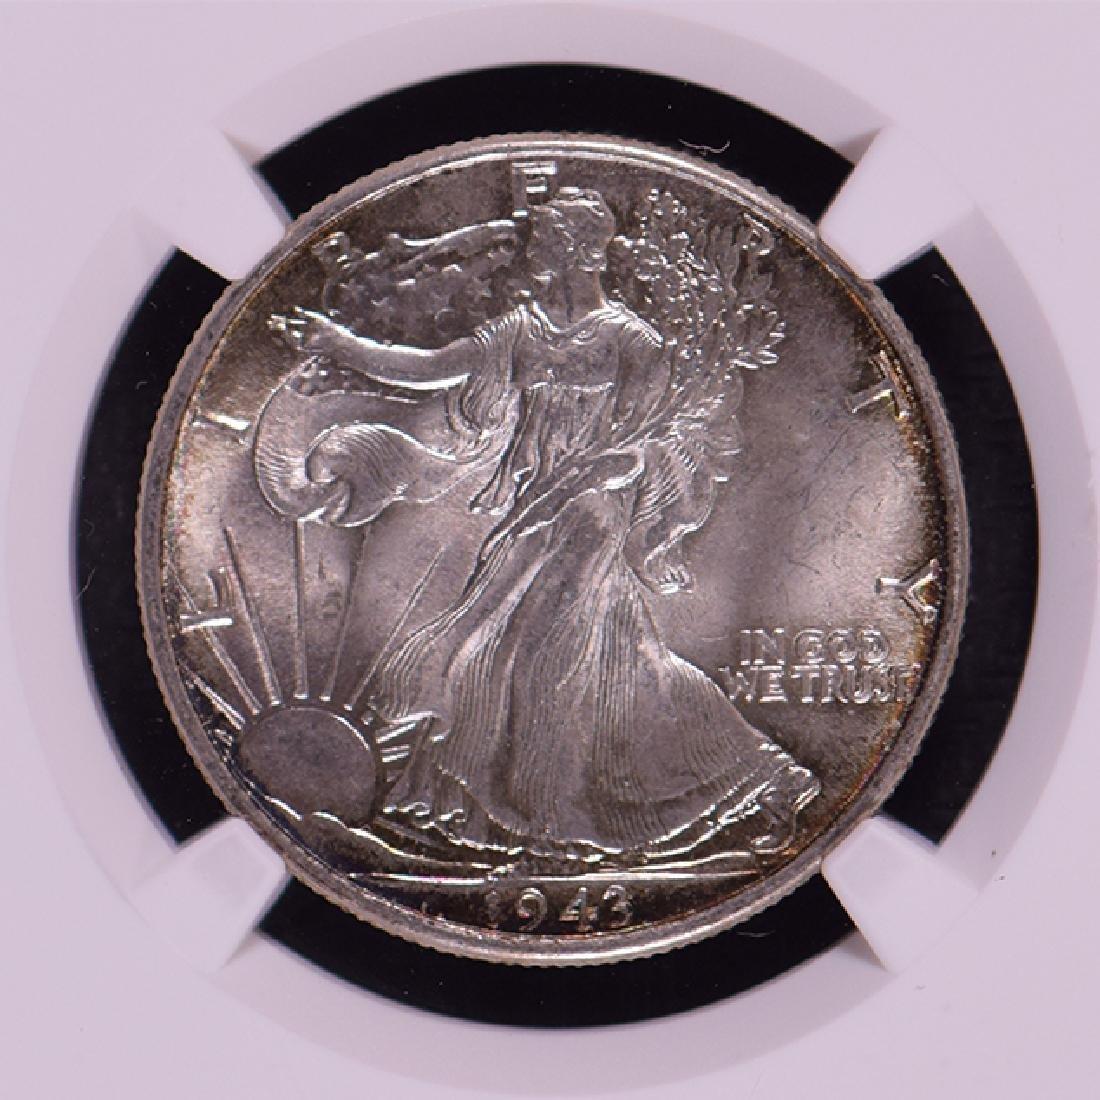 1943 Walking Liberty Half Dollar Coin NGC MS65 - 3